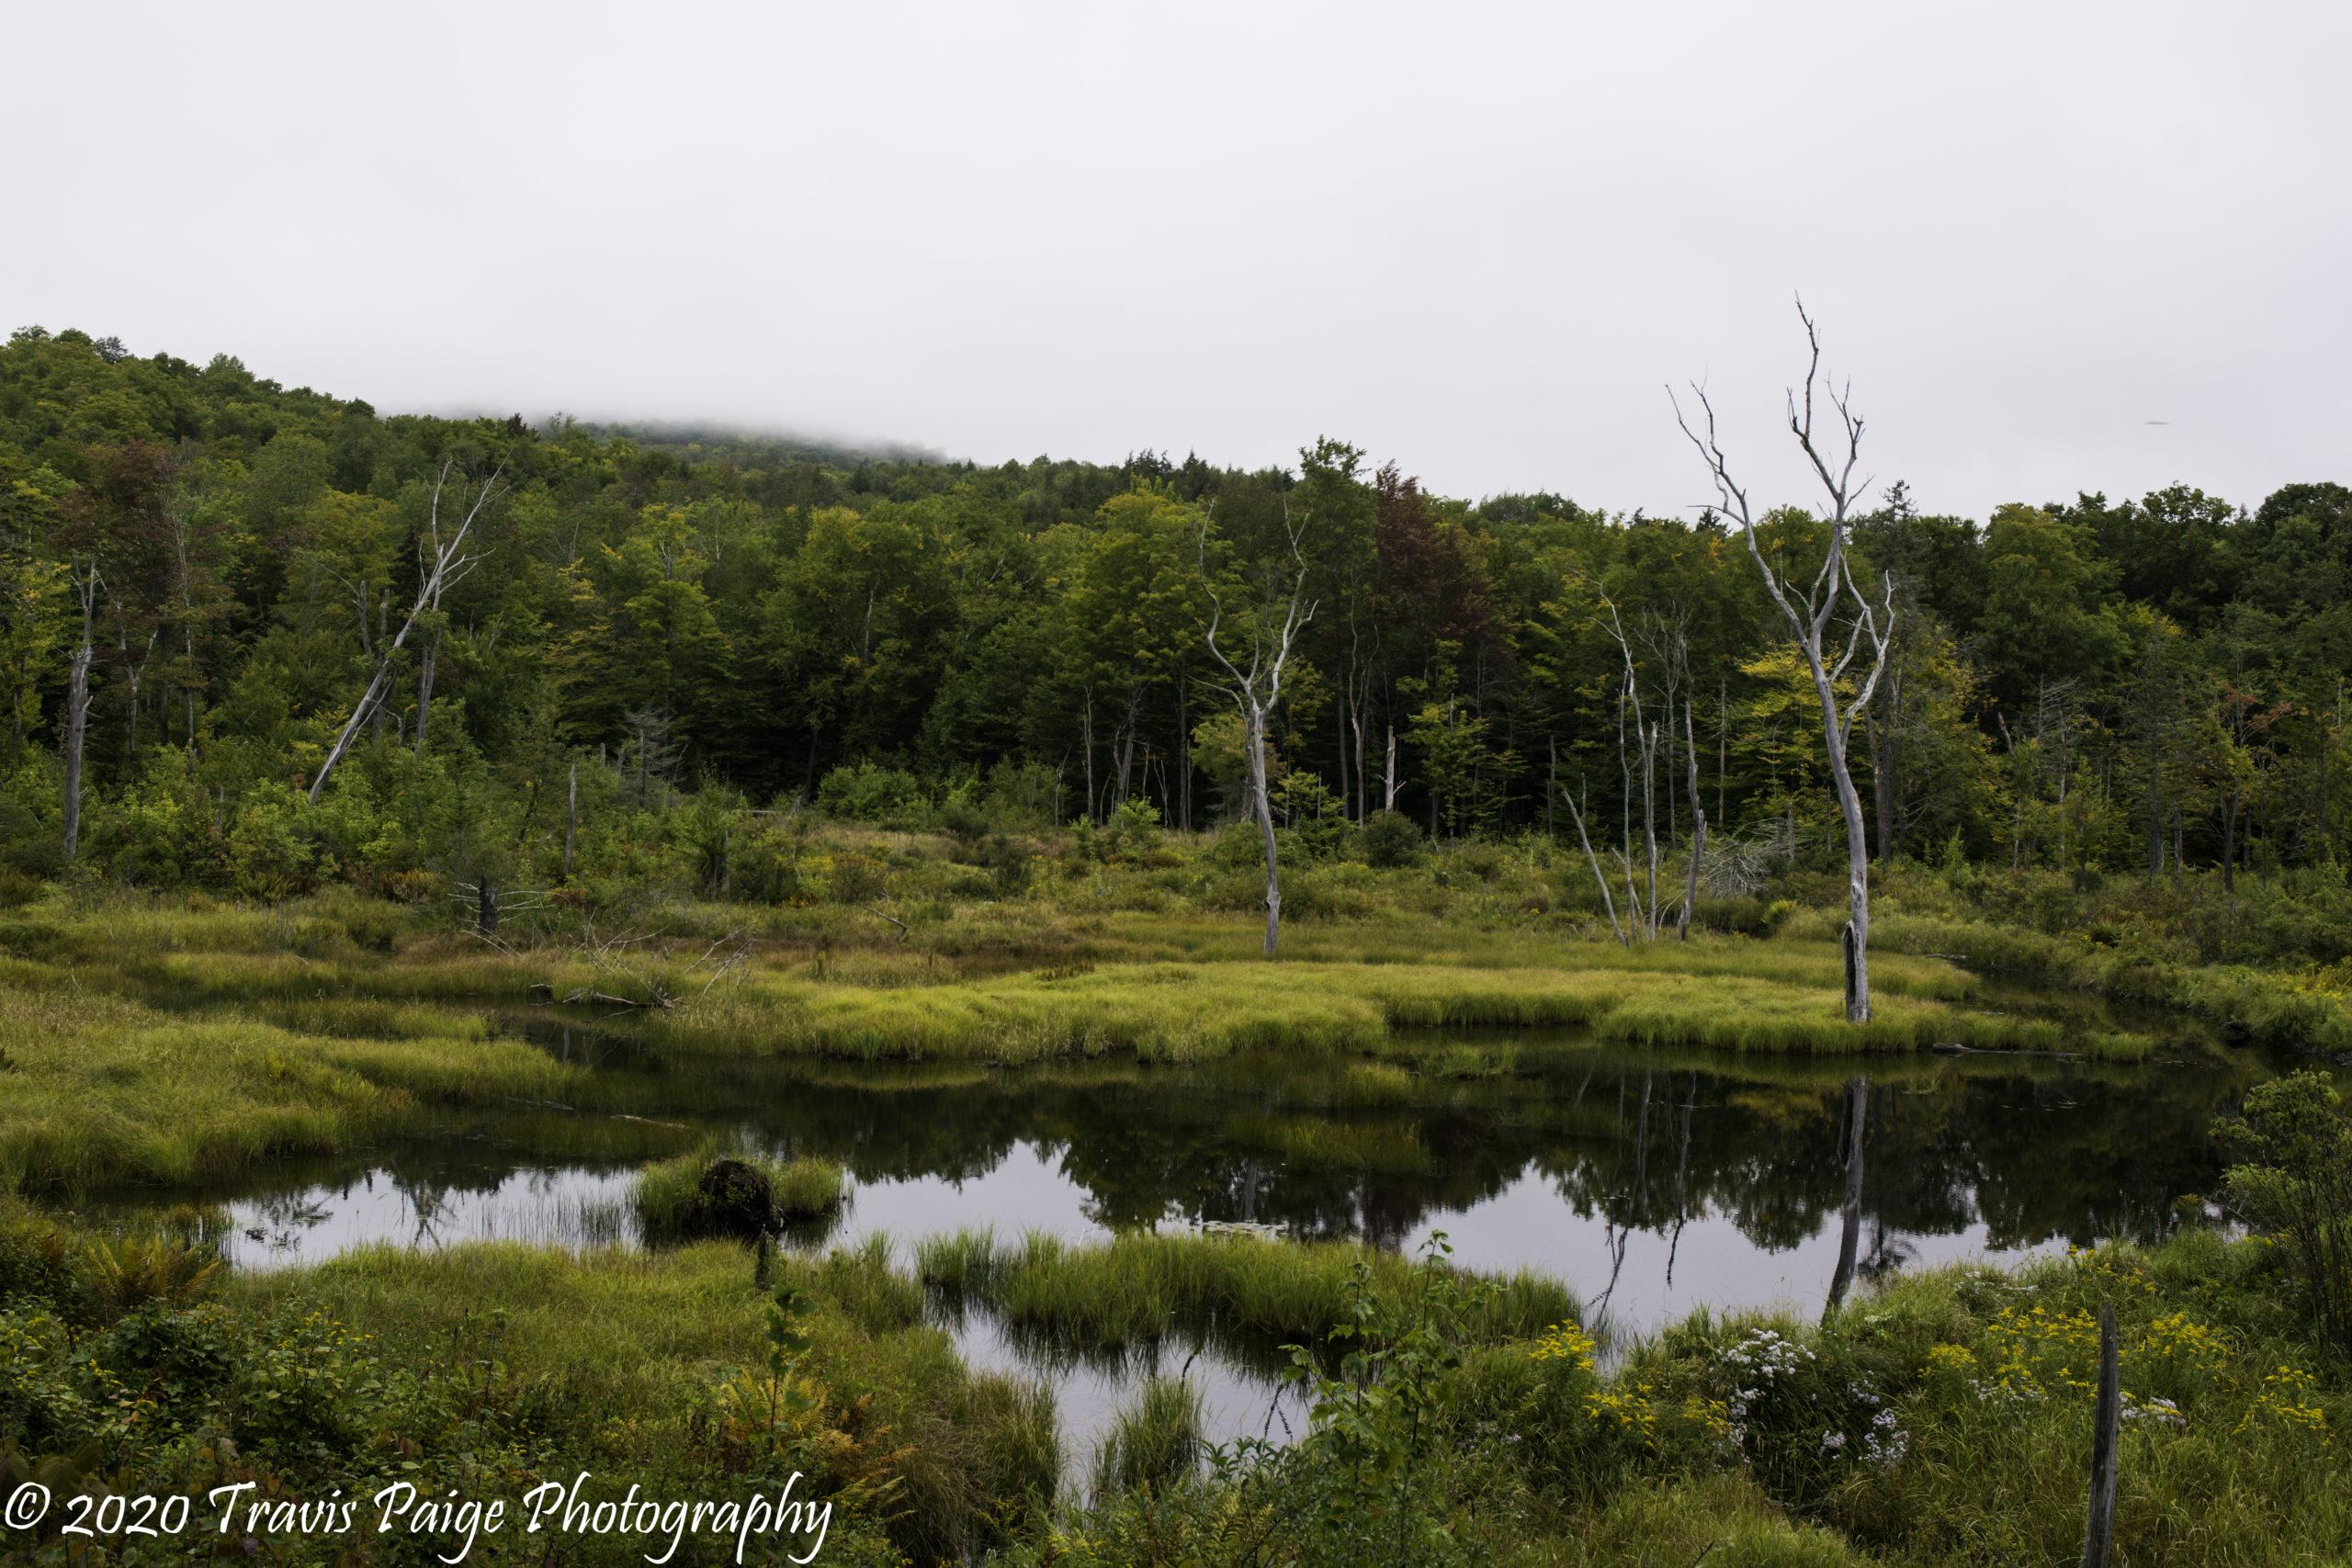 Upper Valley Mountain Biking Green Woodlands